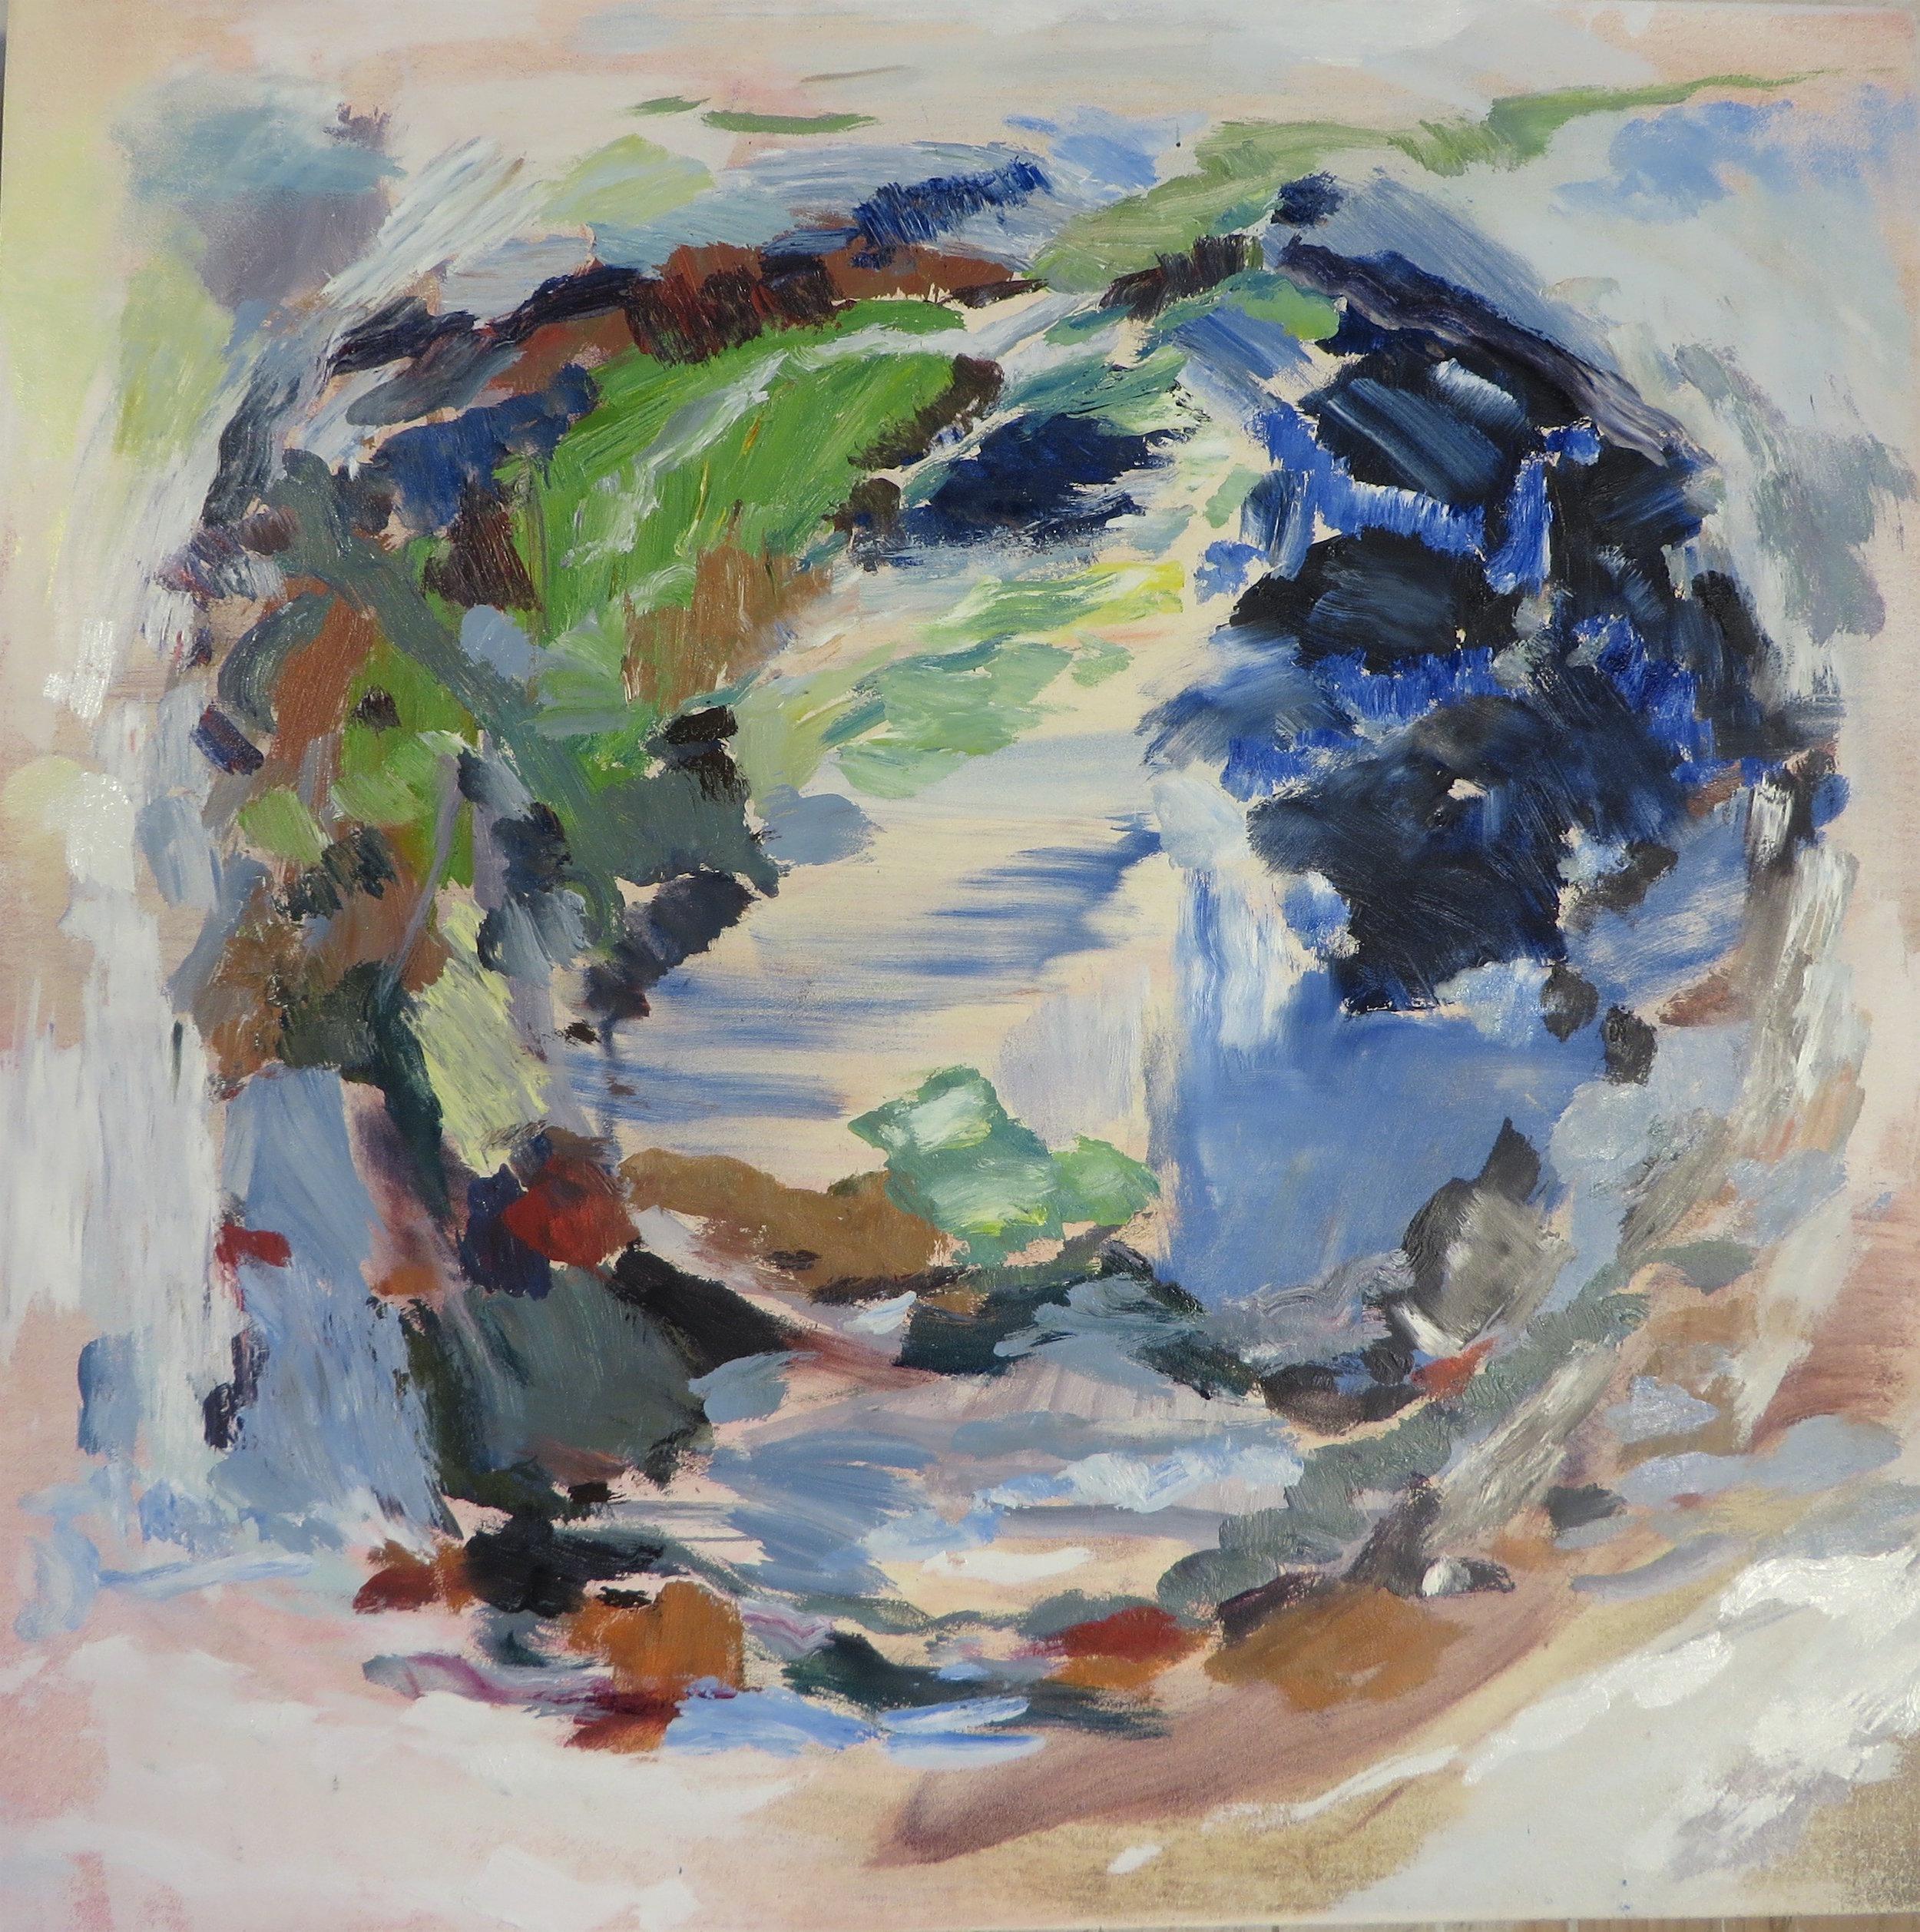 Earth Series 5, 2014